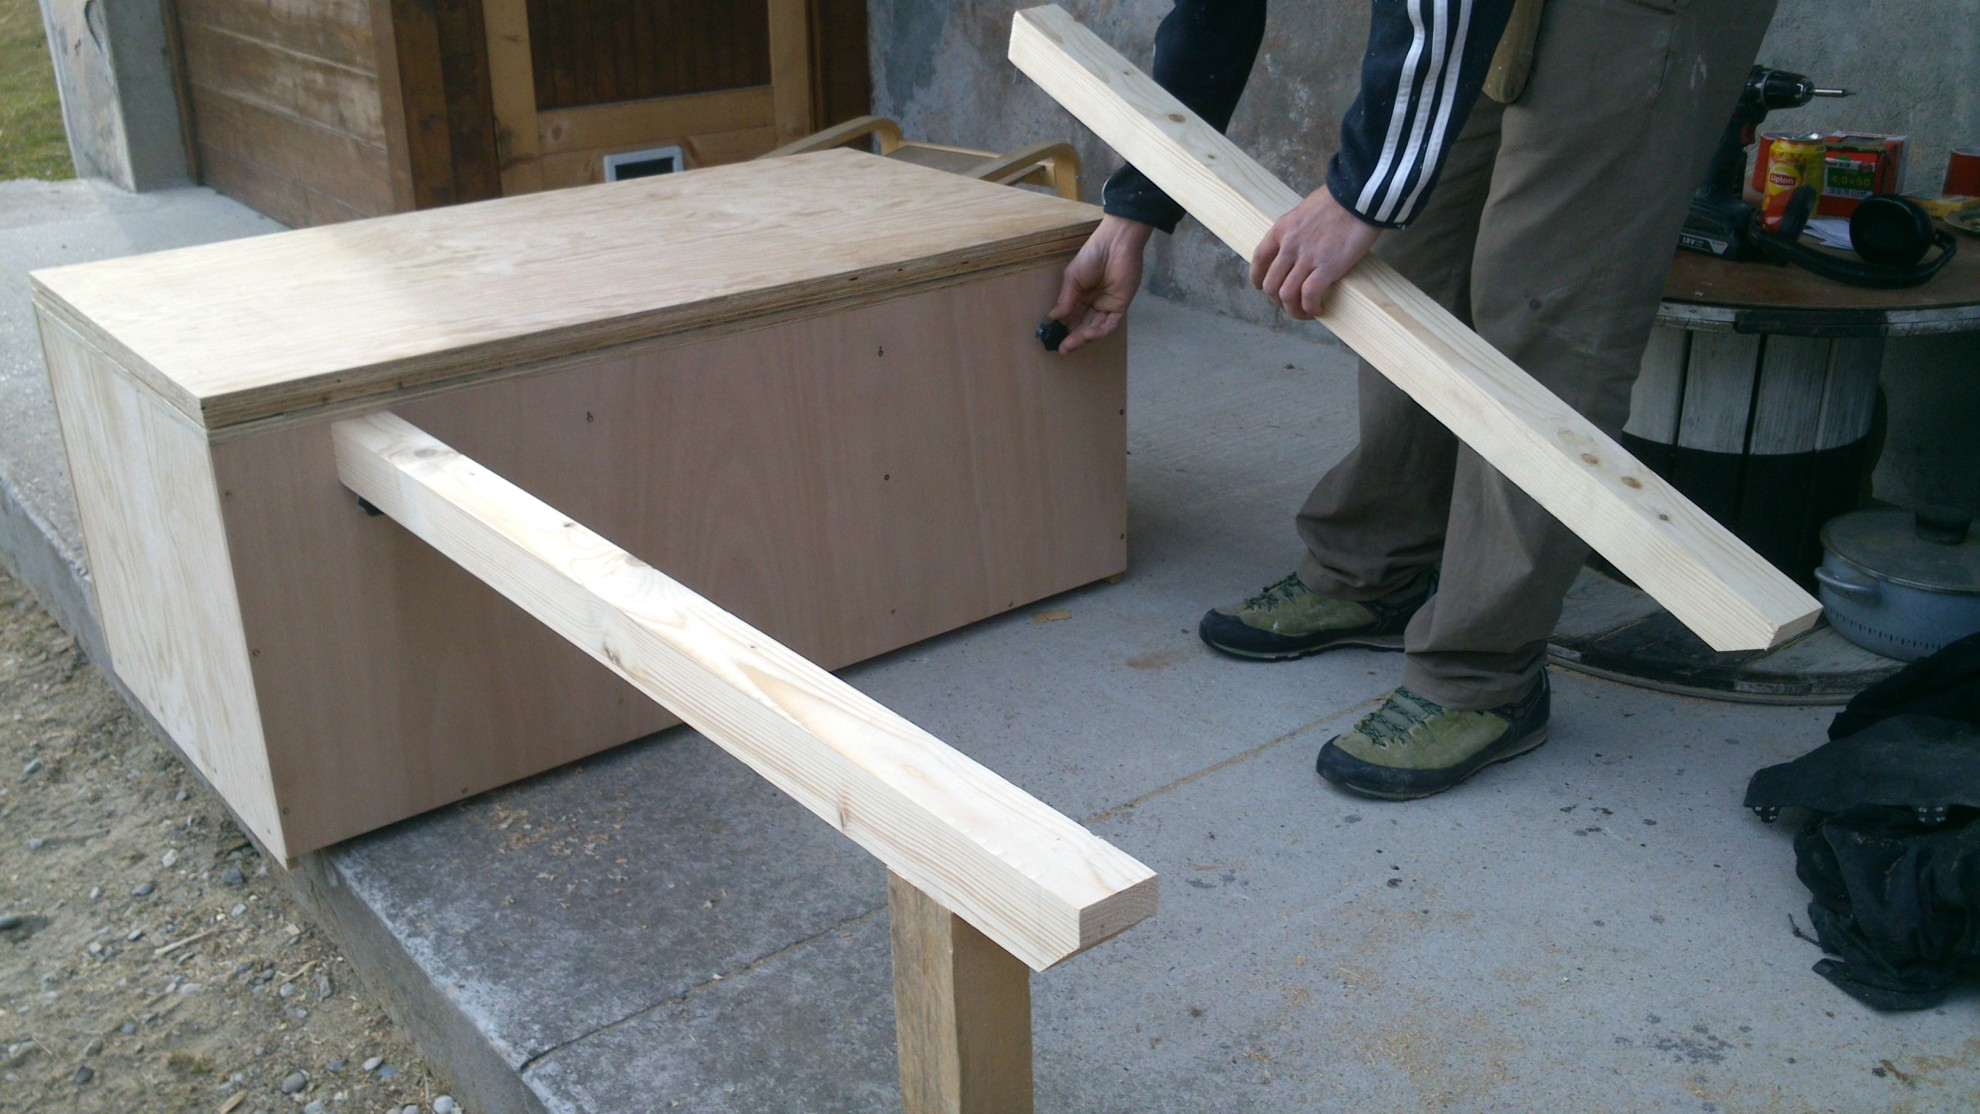 nbc bois am nagement de v hicule amovible. Black Bedroom Furniture Sets. Home Design Ideas